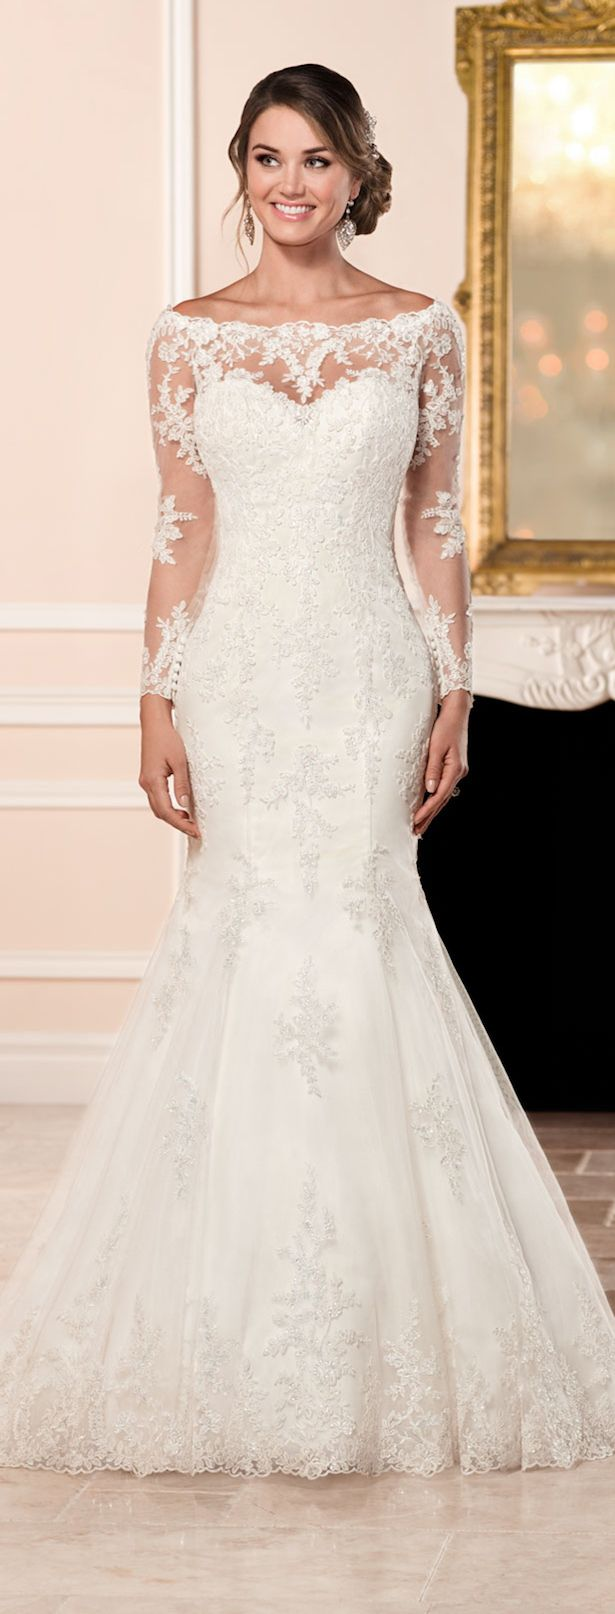 wedding dresses fall wedding dresses 25 Best Ideas about Wedding Dresses on Pinterest Big dresses Weeding dresses and Pretty wedding dresses